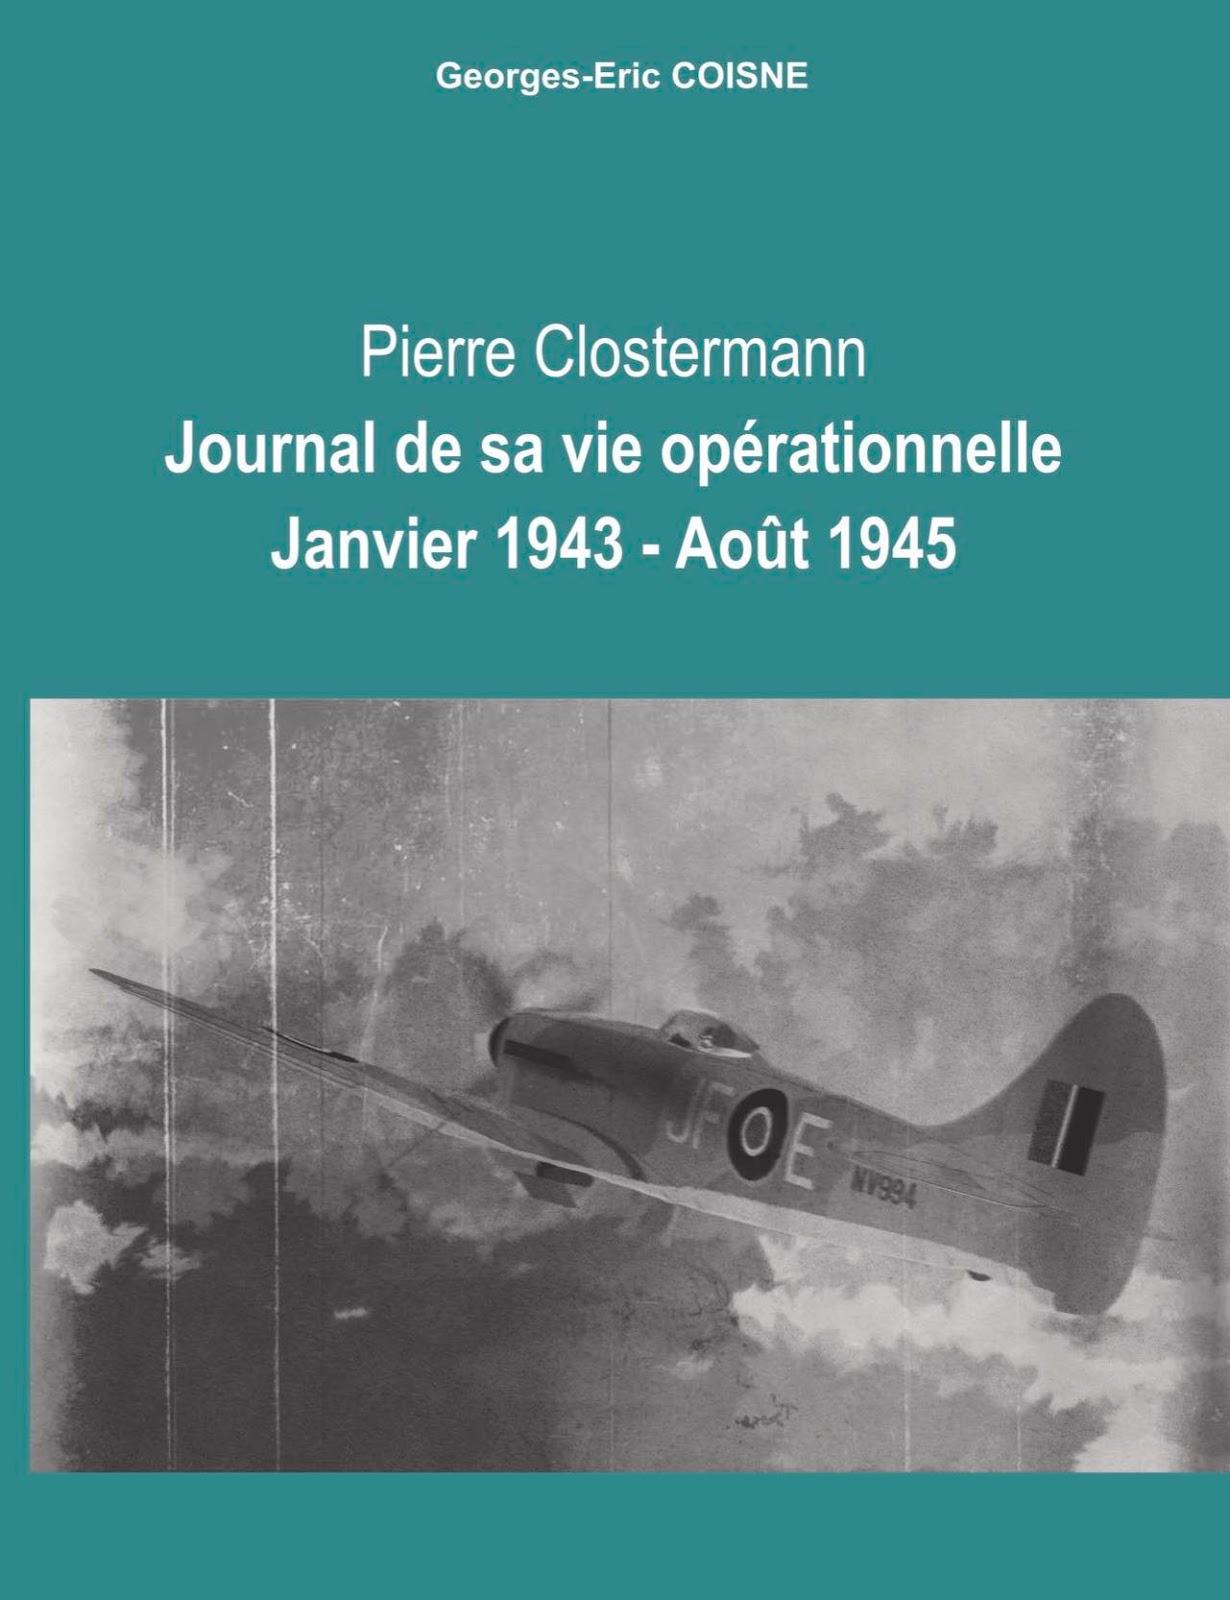 Clostermann-couverture.jpg